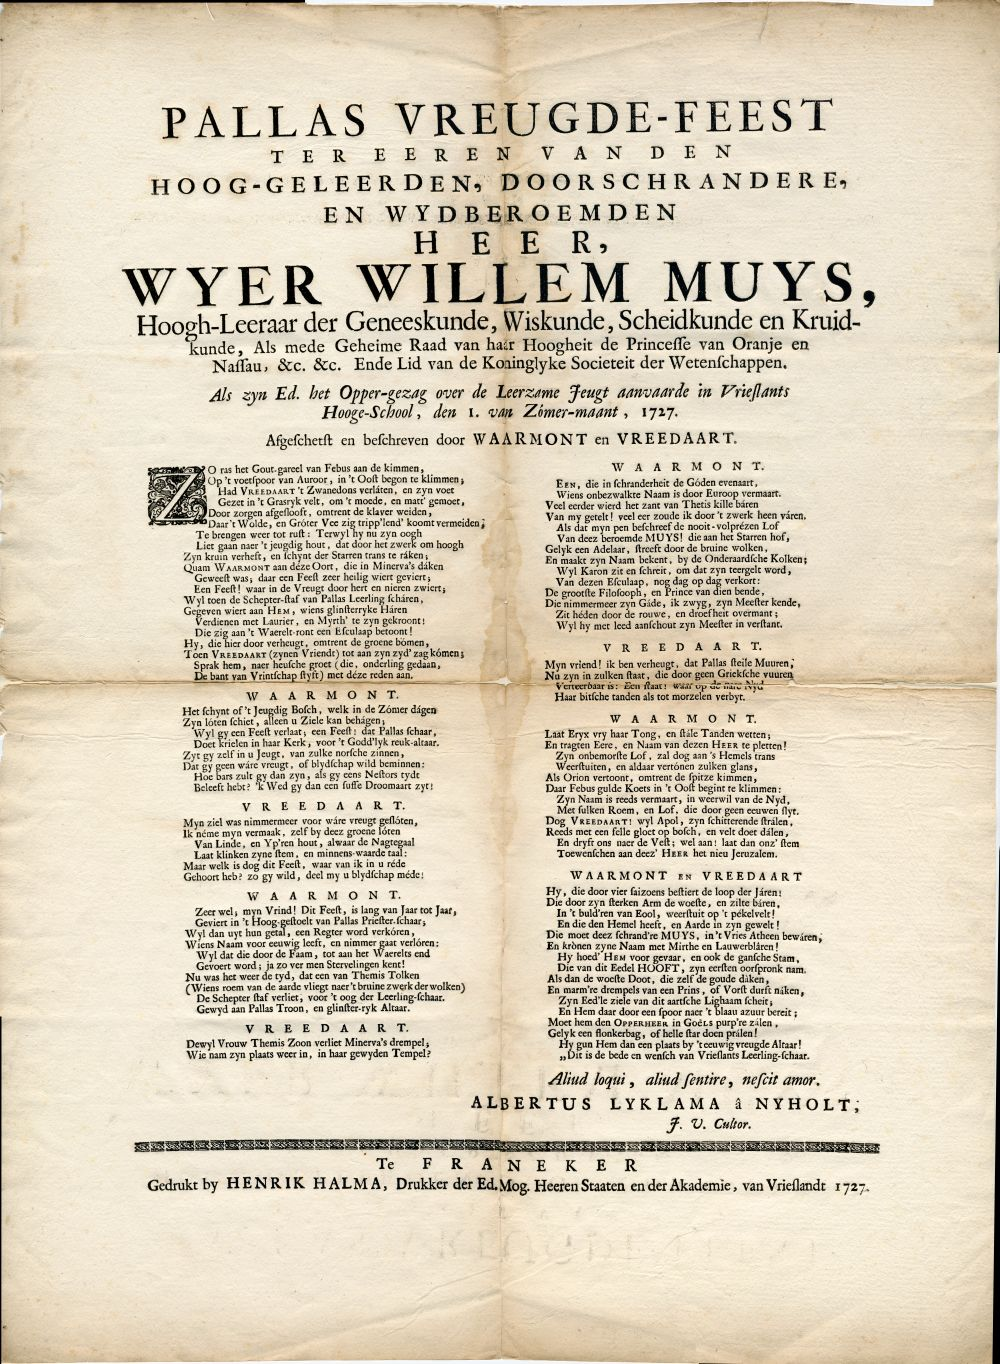 Gedicht voor Wijer Willem Muys